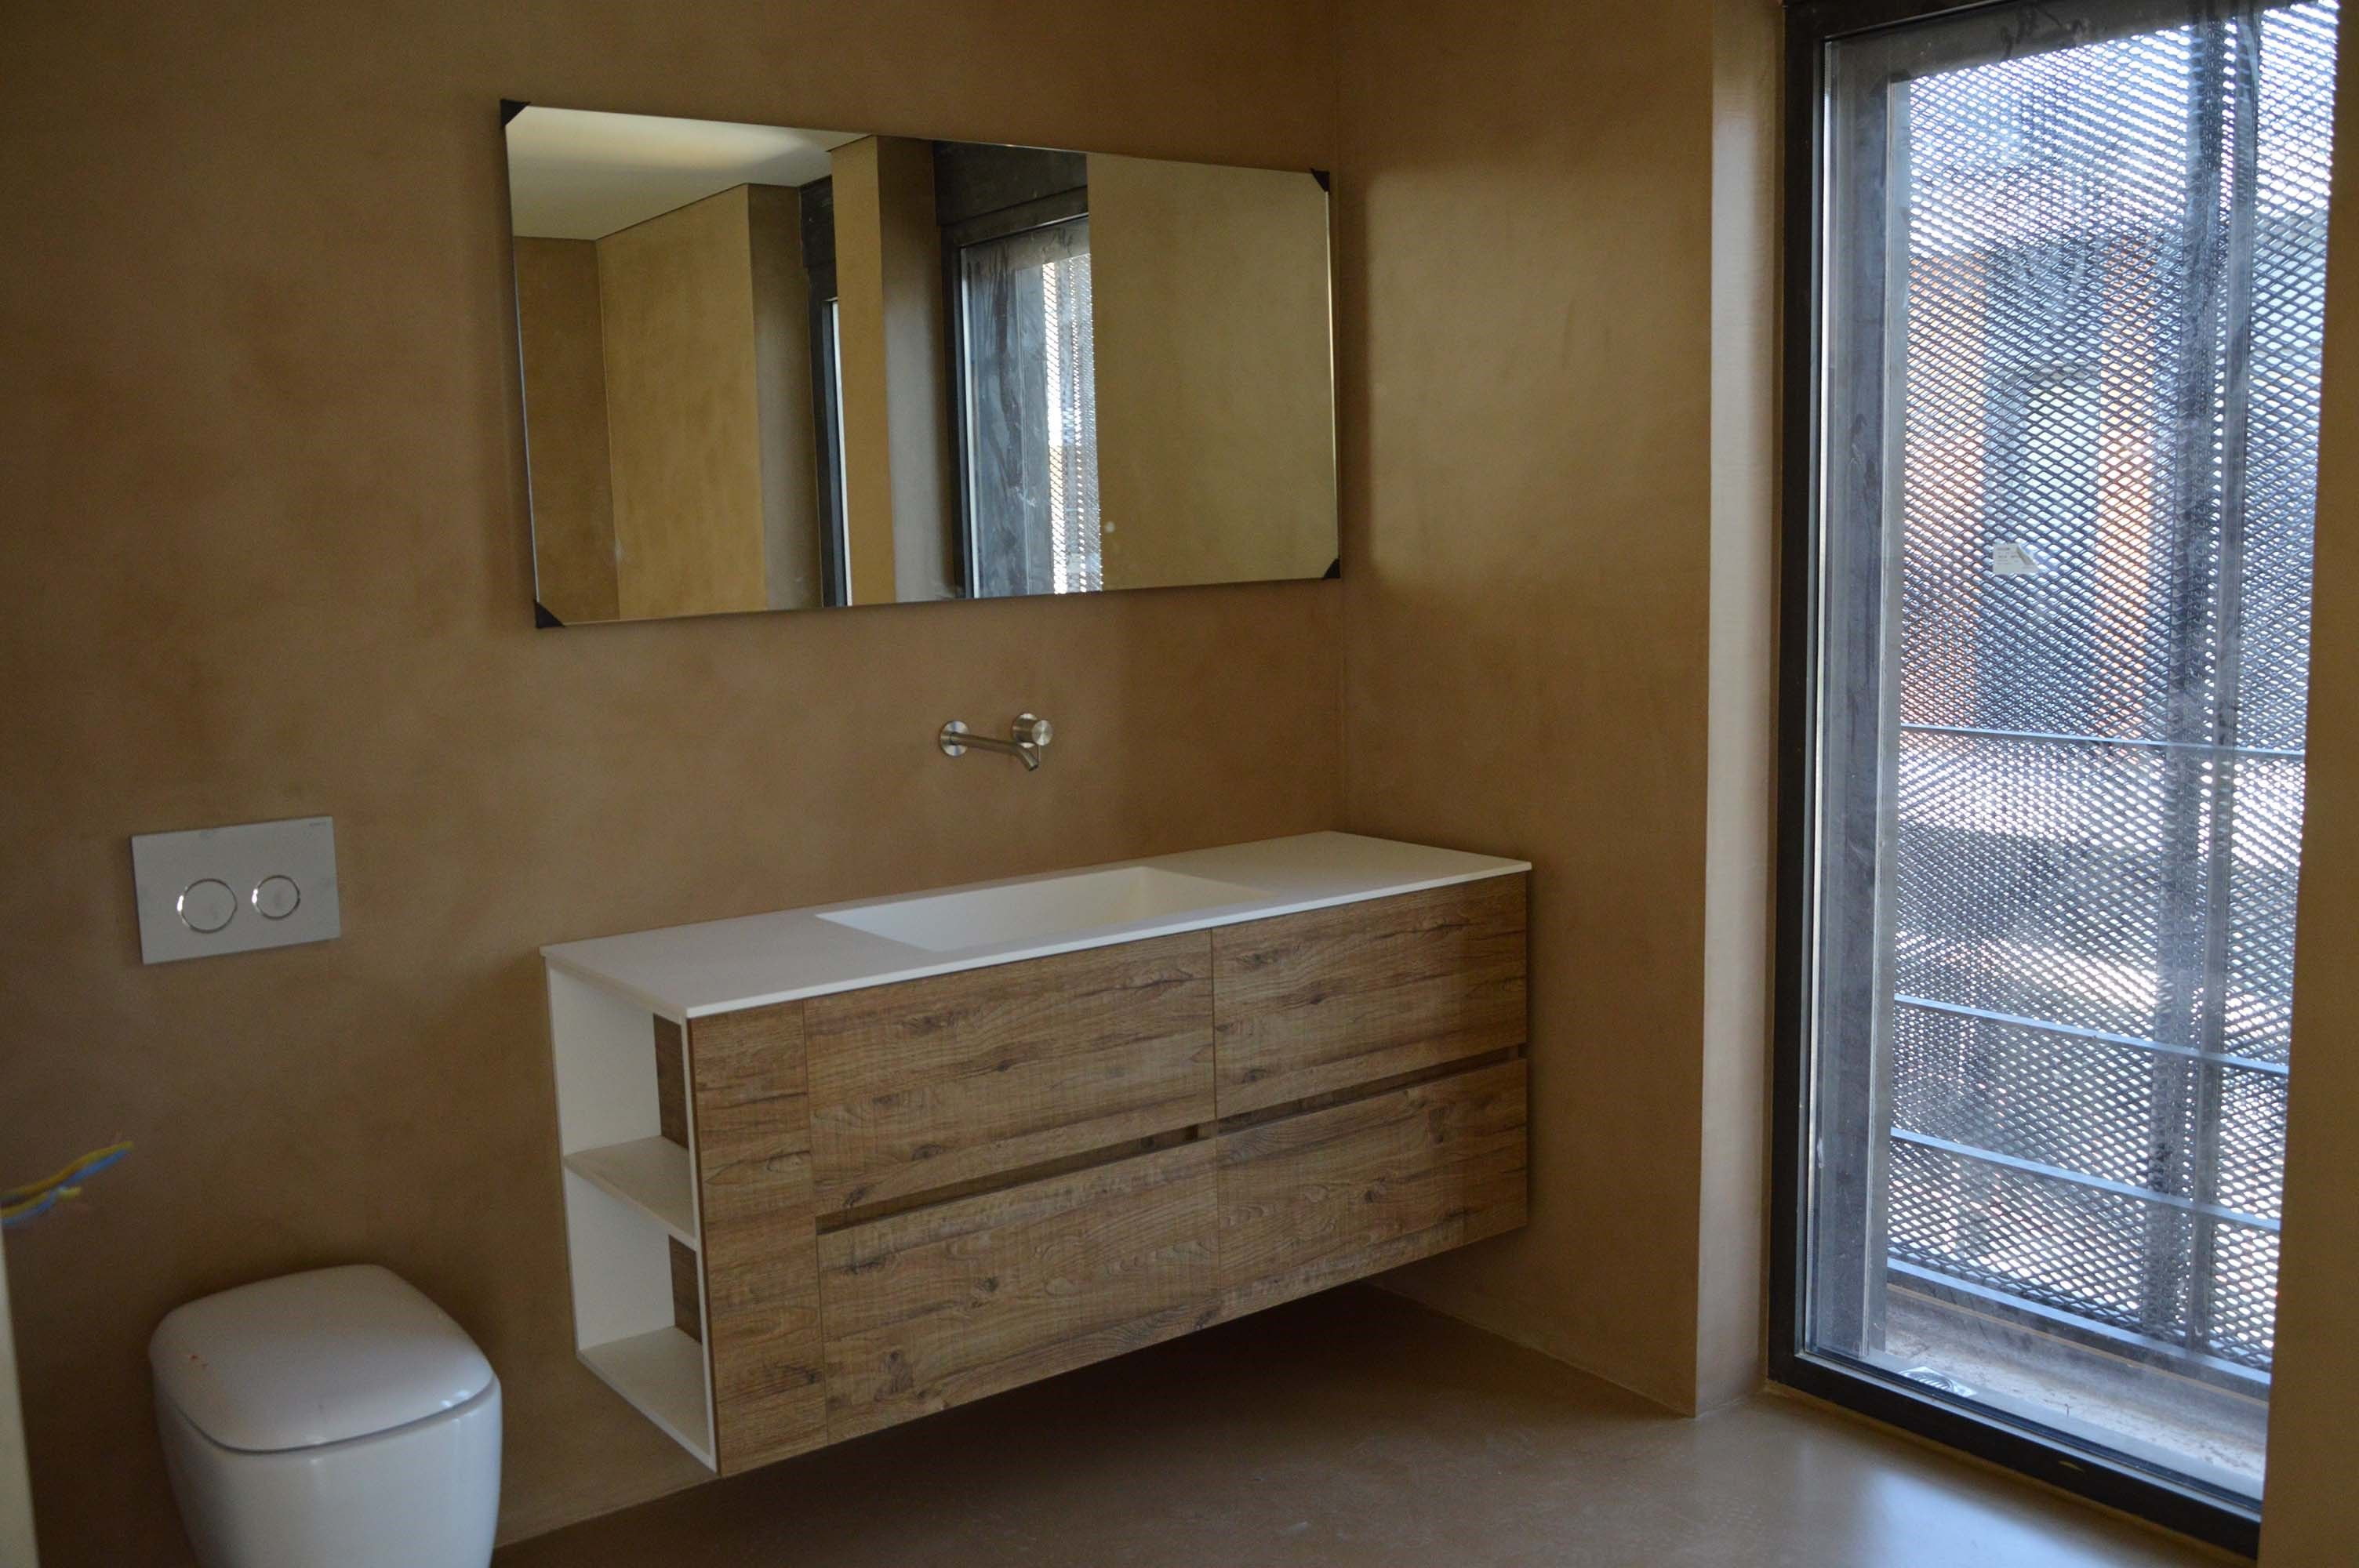 sherwood s072 by novel bathroom furniture